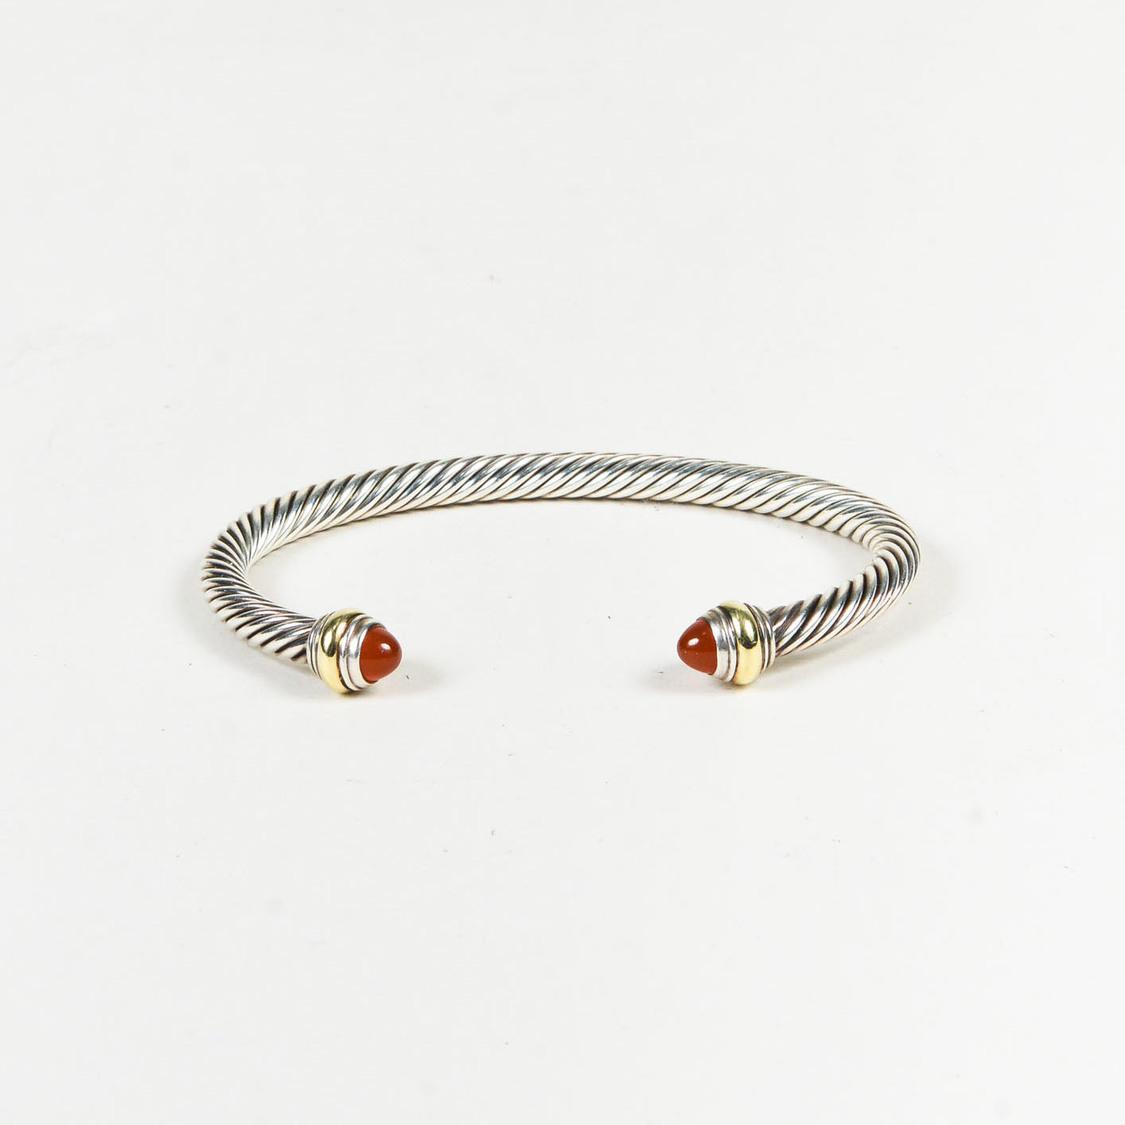 David Yurman Cable Classics sterling silver & 14kt yellow gold accented cuff bracelet - Metallic cJ9GLC